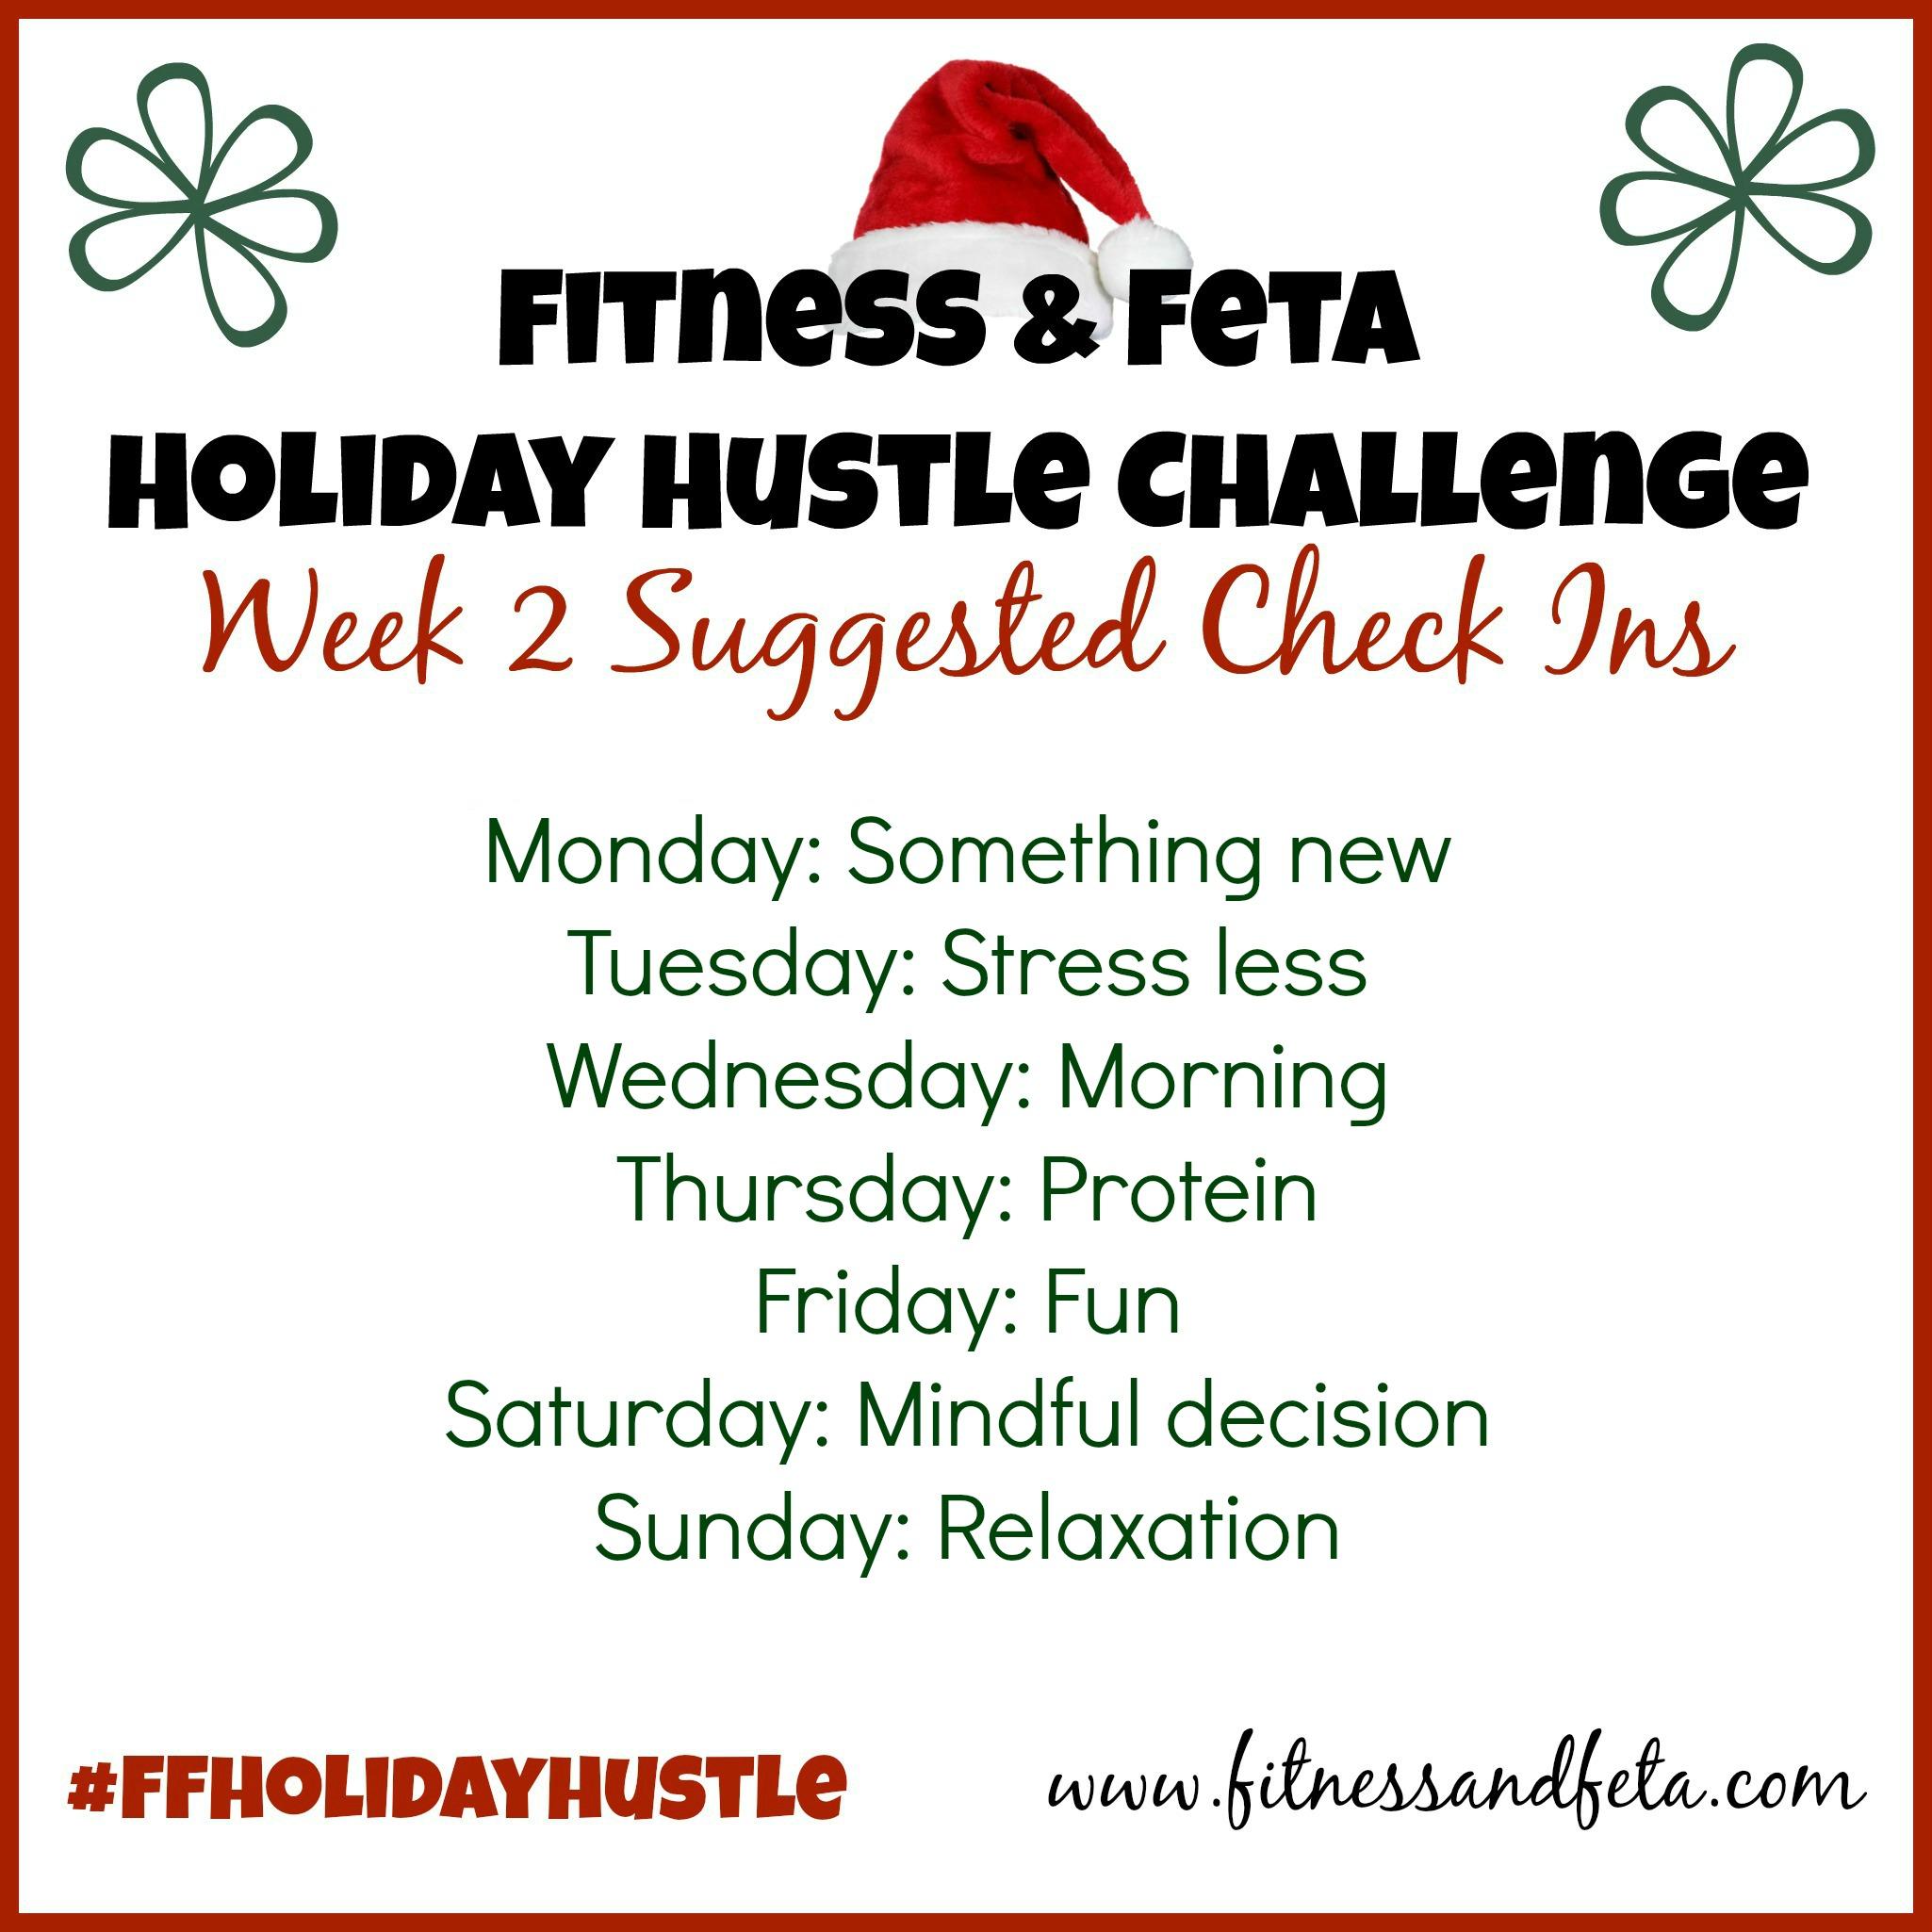 Week 2 Check Ins